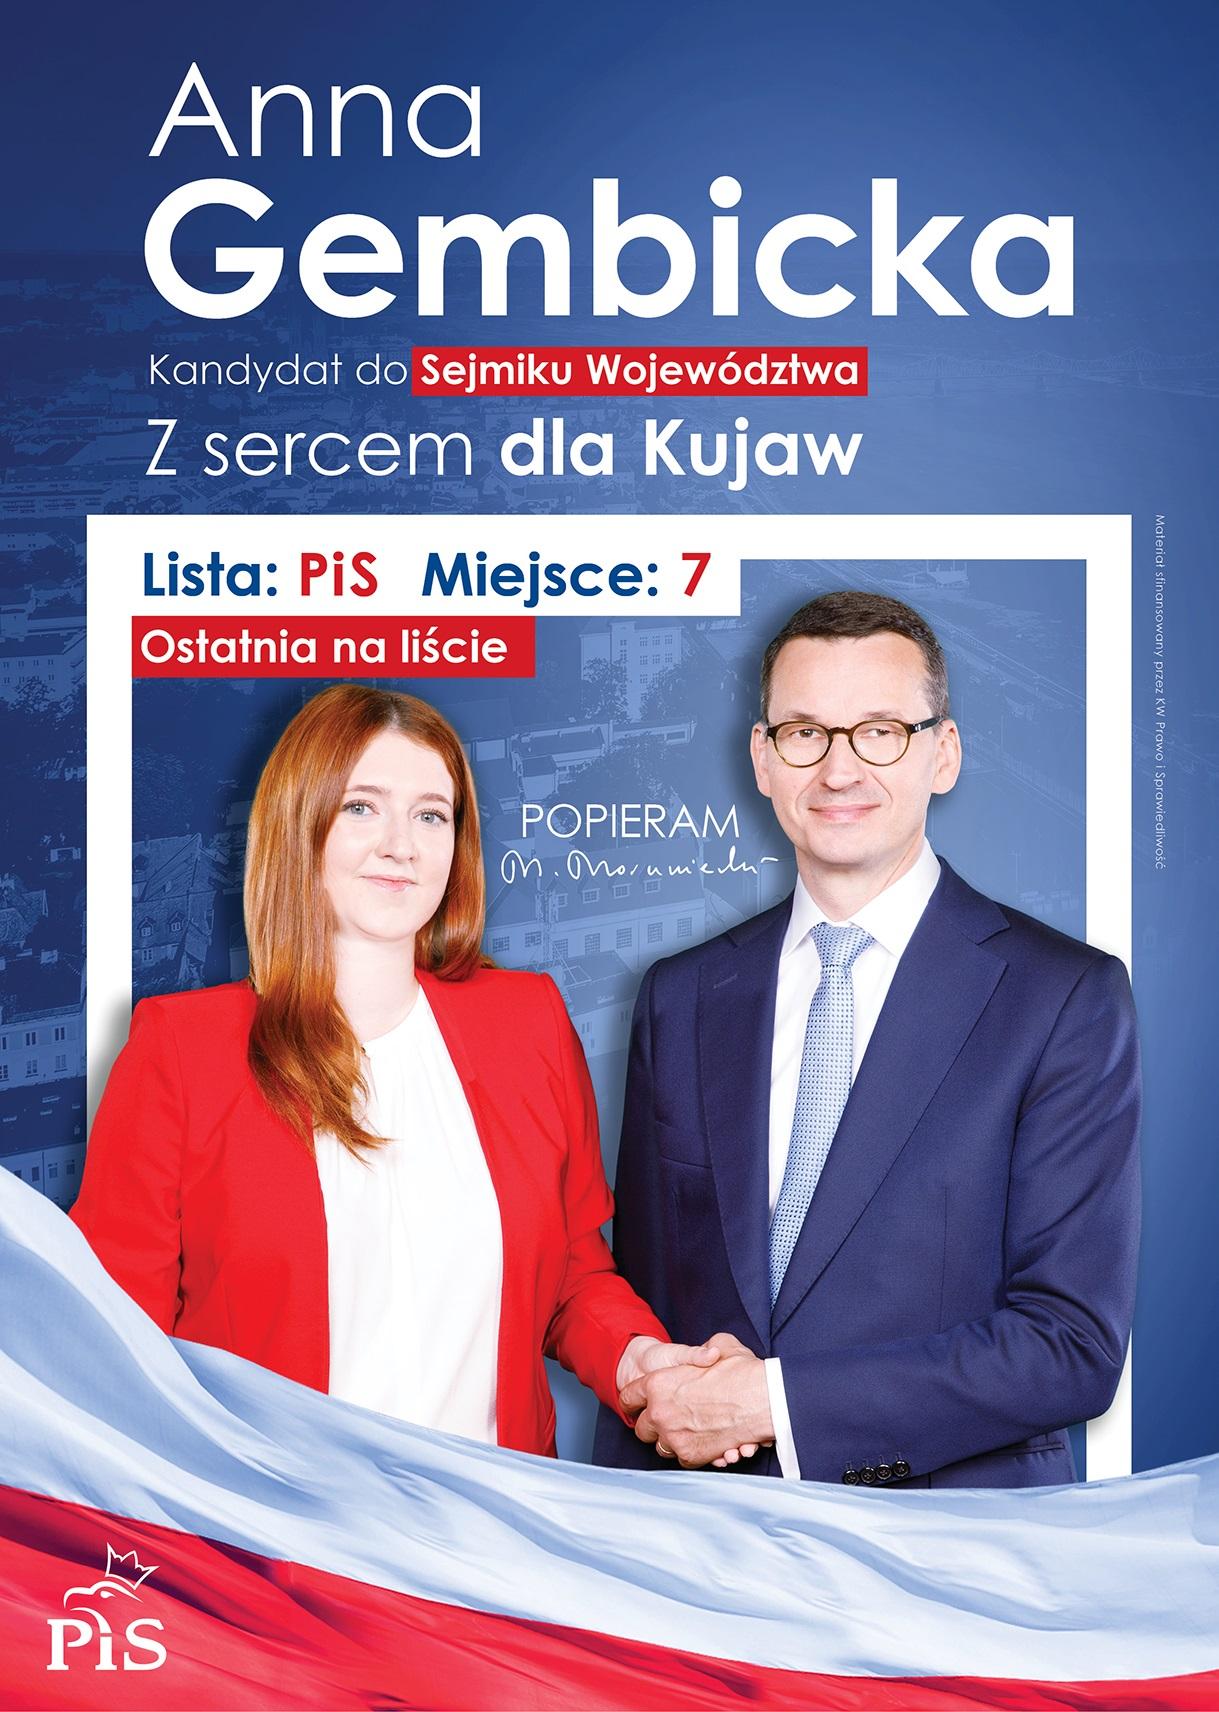 Gembicka Anna1